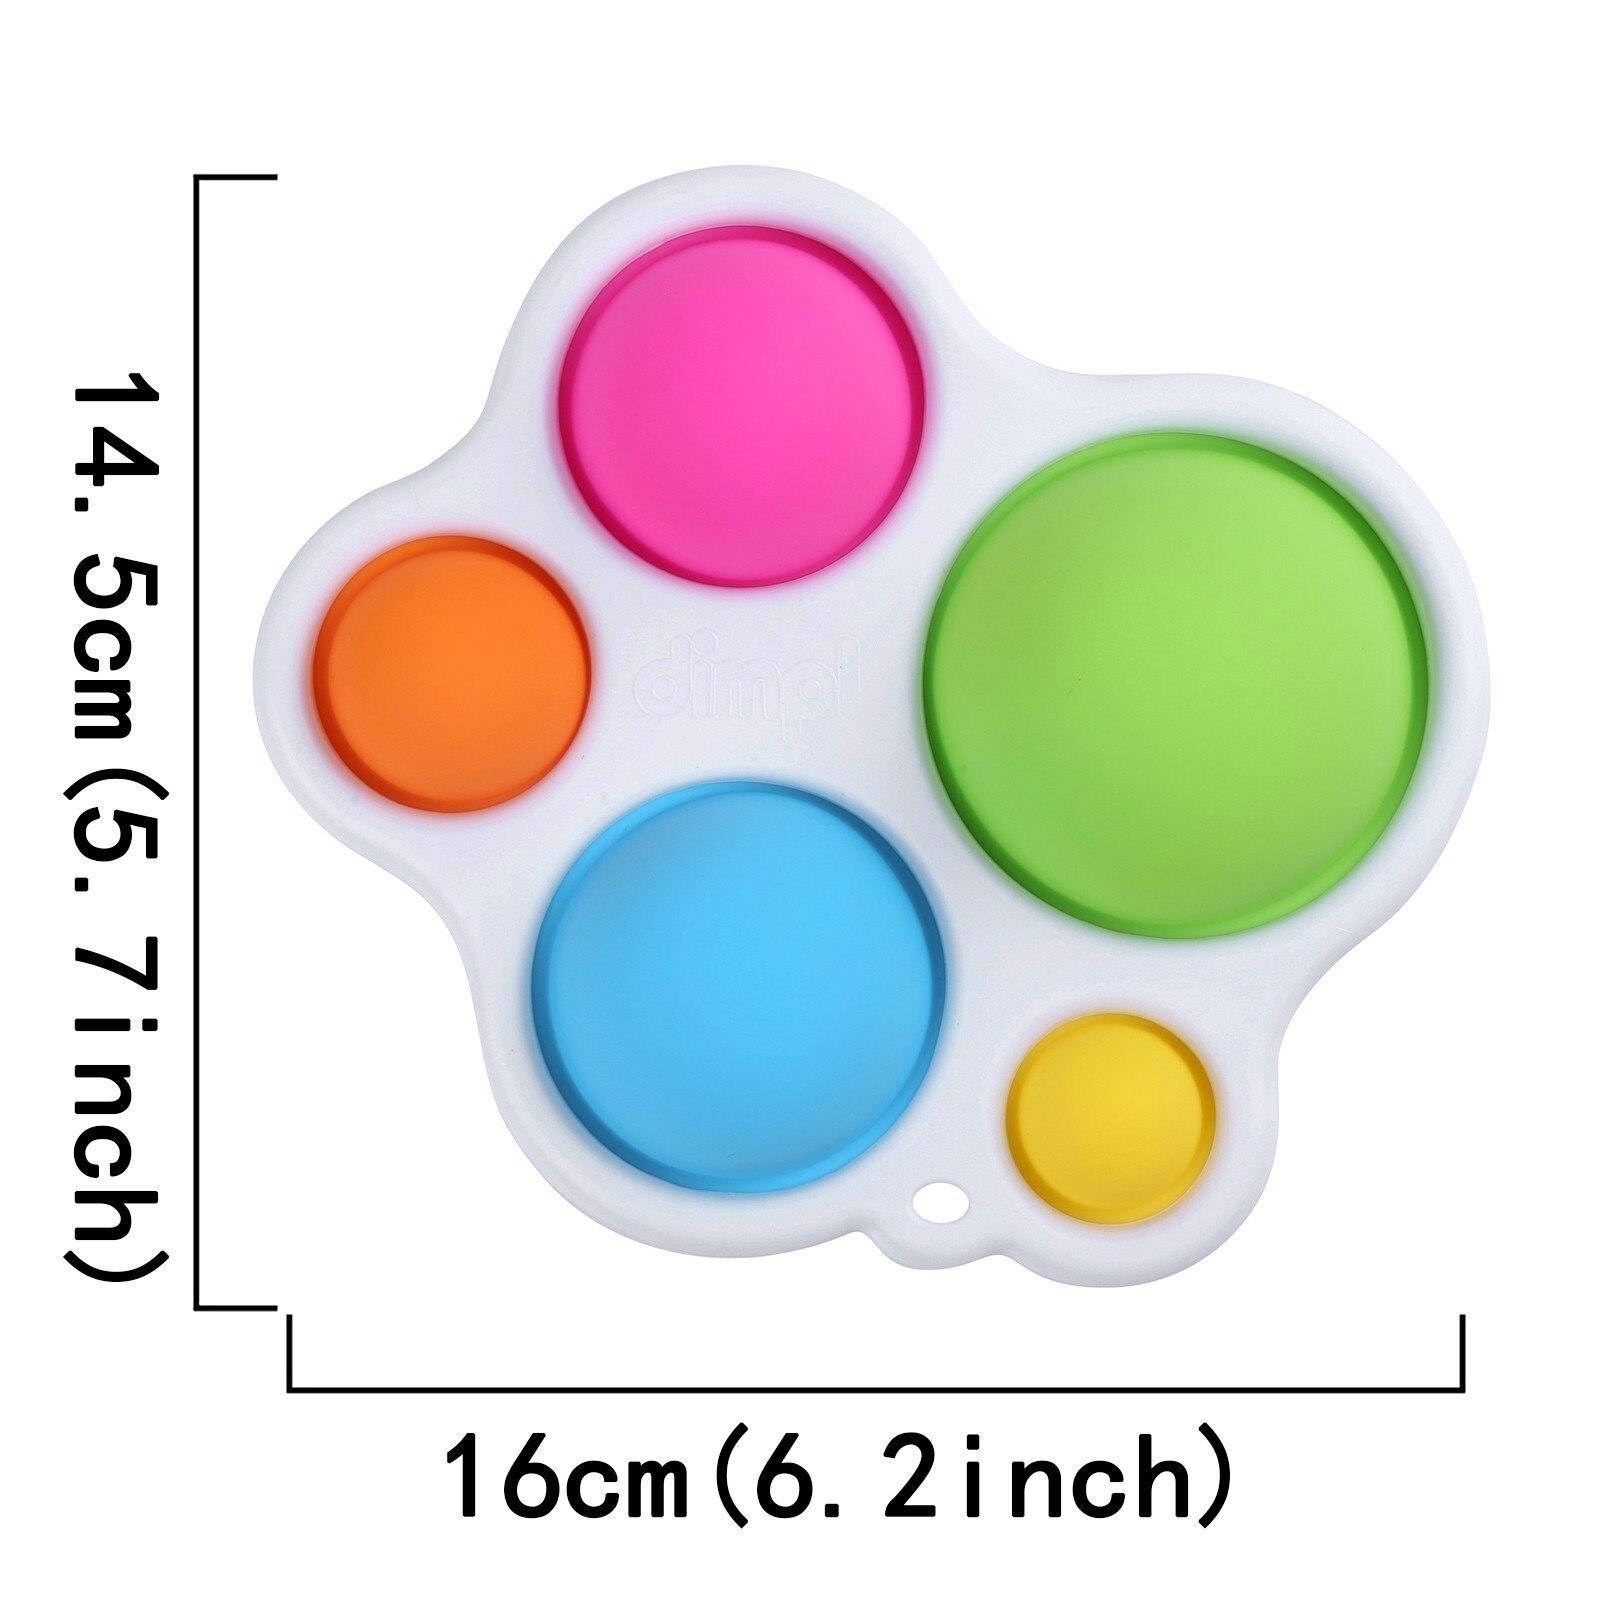 Toy Fidget-Toys Puzzle Baby-Toy Training Simple Dimple It-Sensory Pops Brain-Development-Enlightenment img3